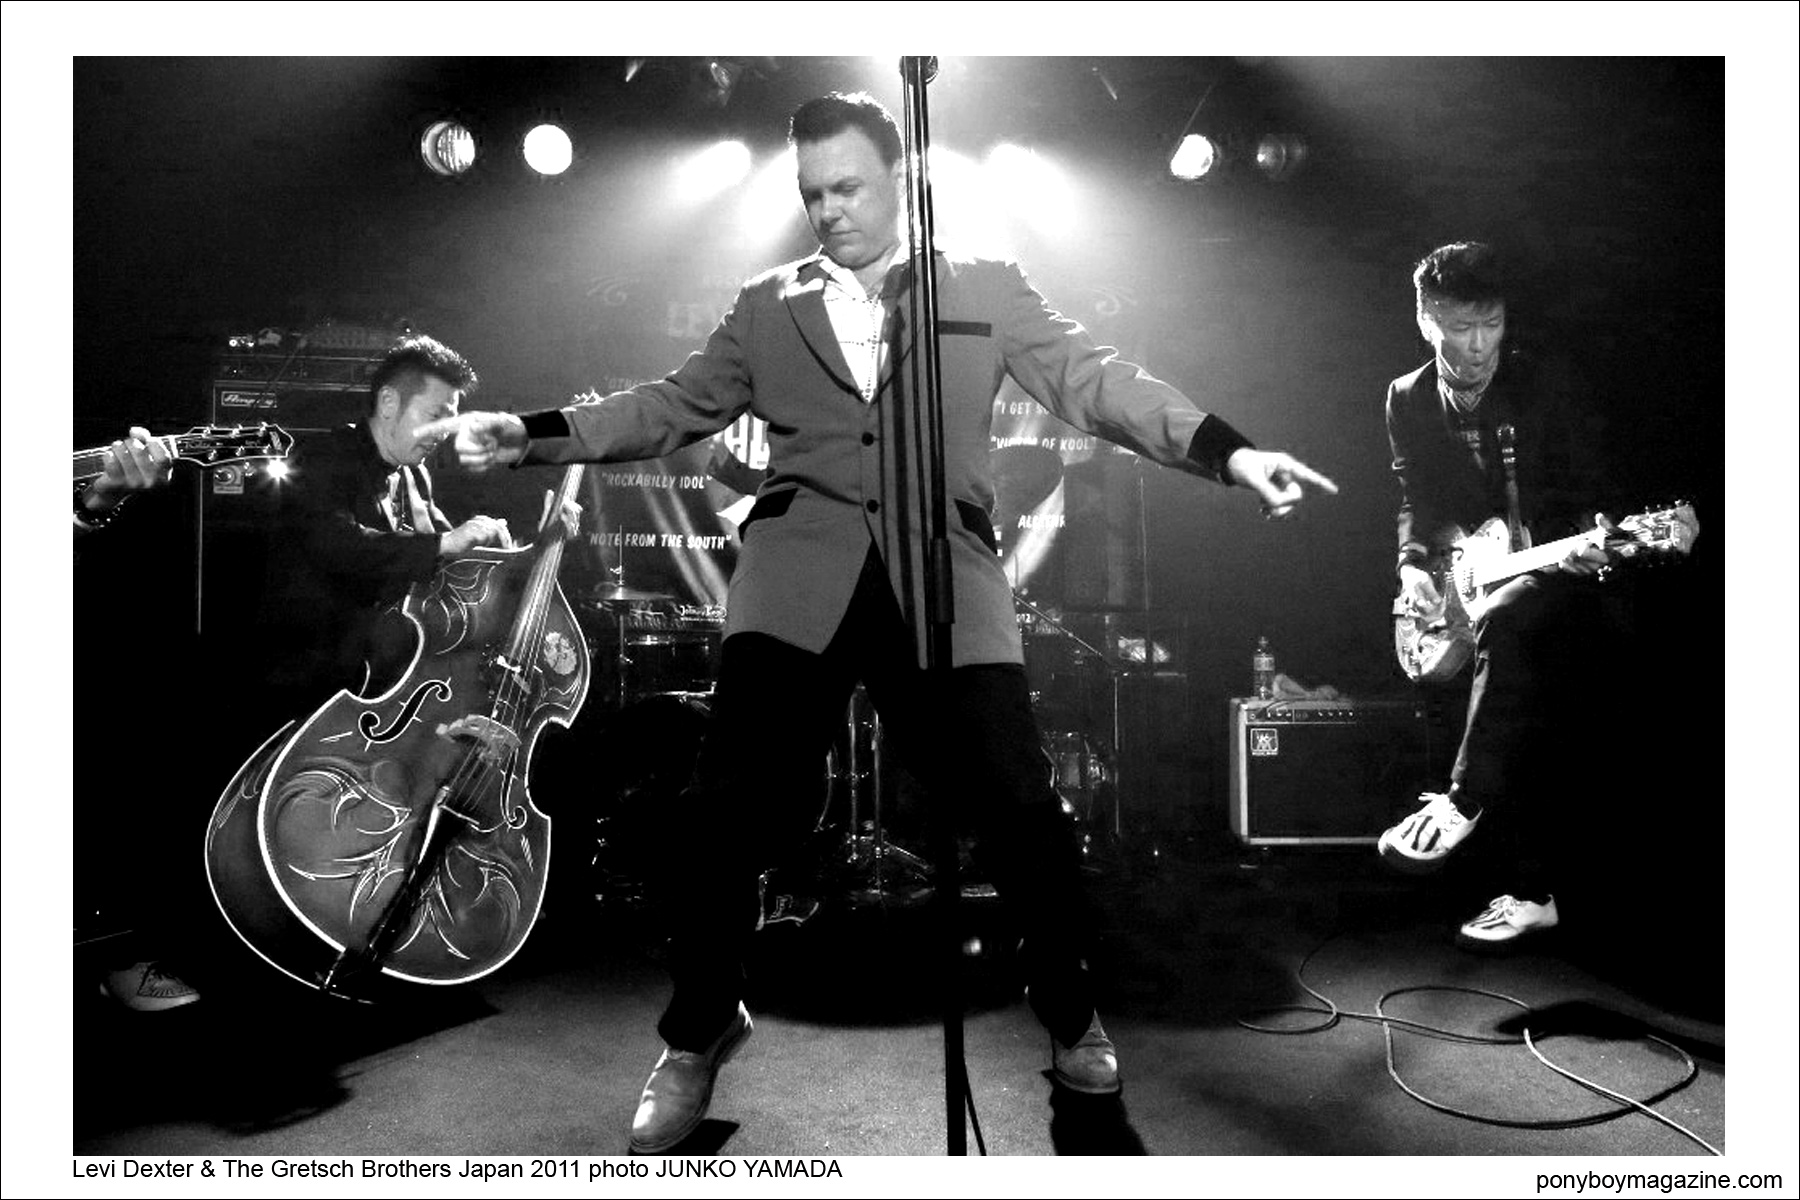 Levi Dexter & The Gretsch Brothers in Japan, circa 2011, photo Junko Yamada, Ponyboy Magazine.